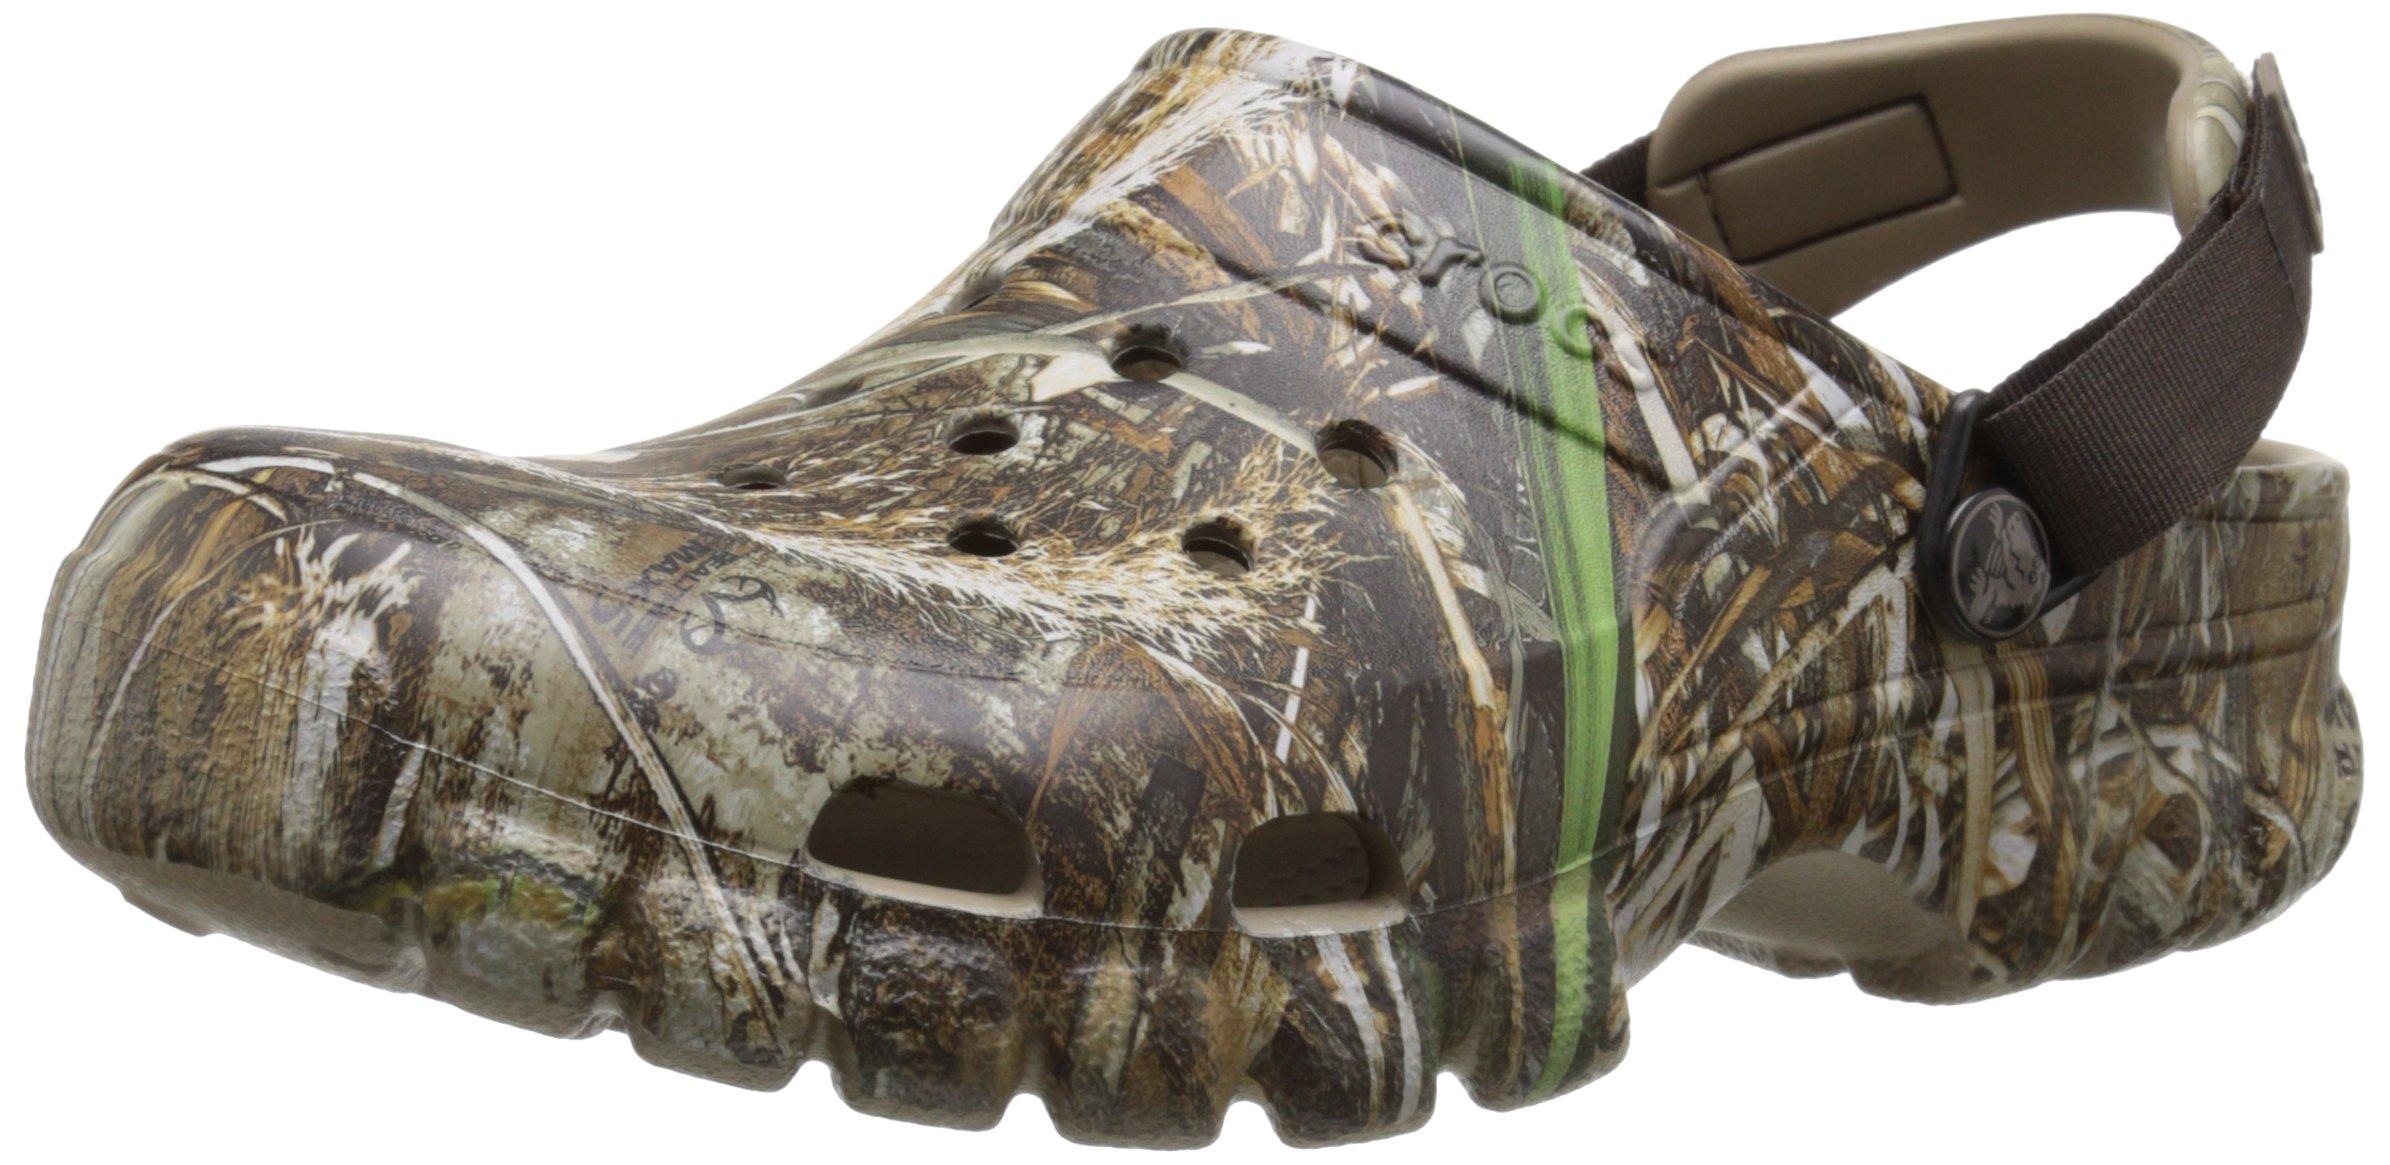 crocs Unisex Offroad Sport Realtree Max-5 Clog,  Chocolate/Khaki, 11 M (D) US Men's/13 M (B) US Women